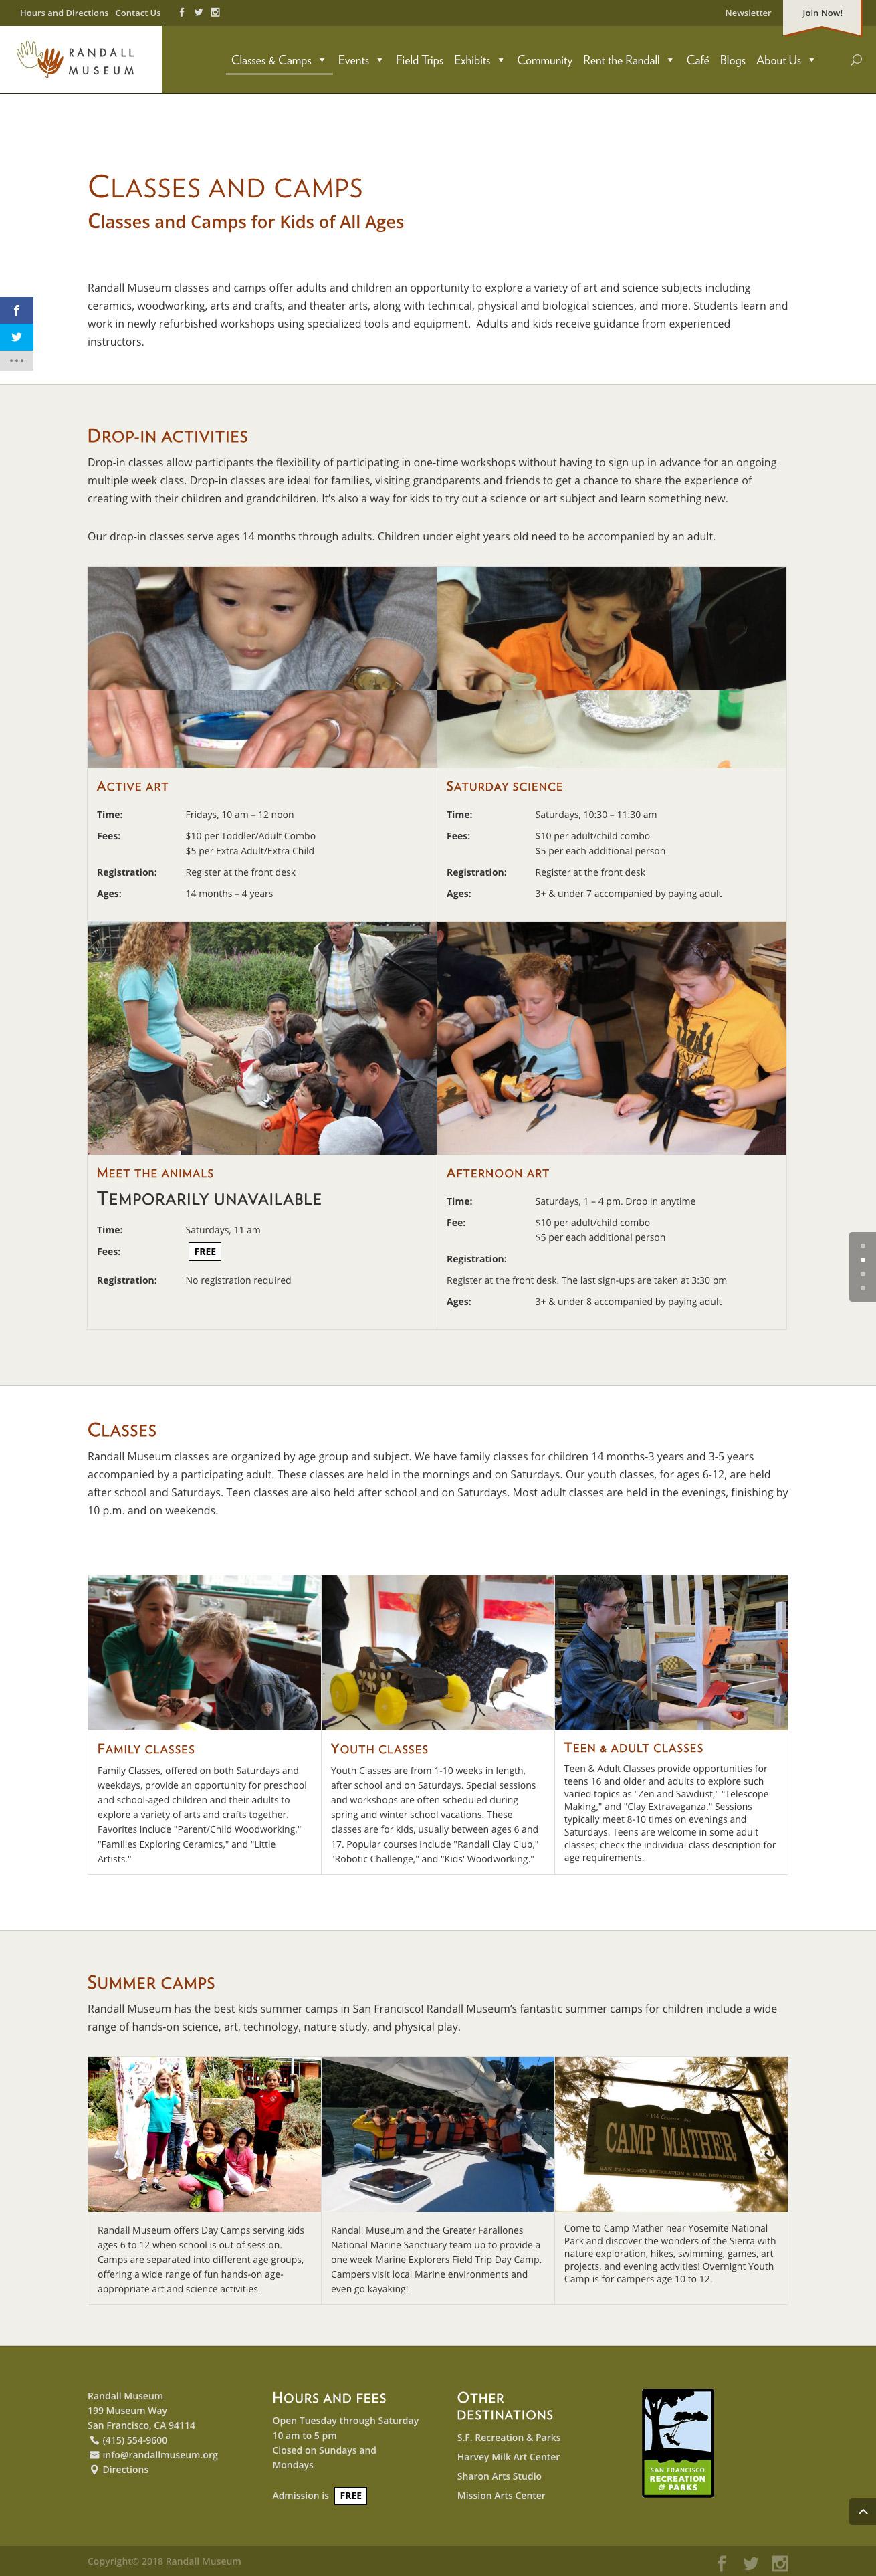 randallmuseum-org-classes-camps